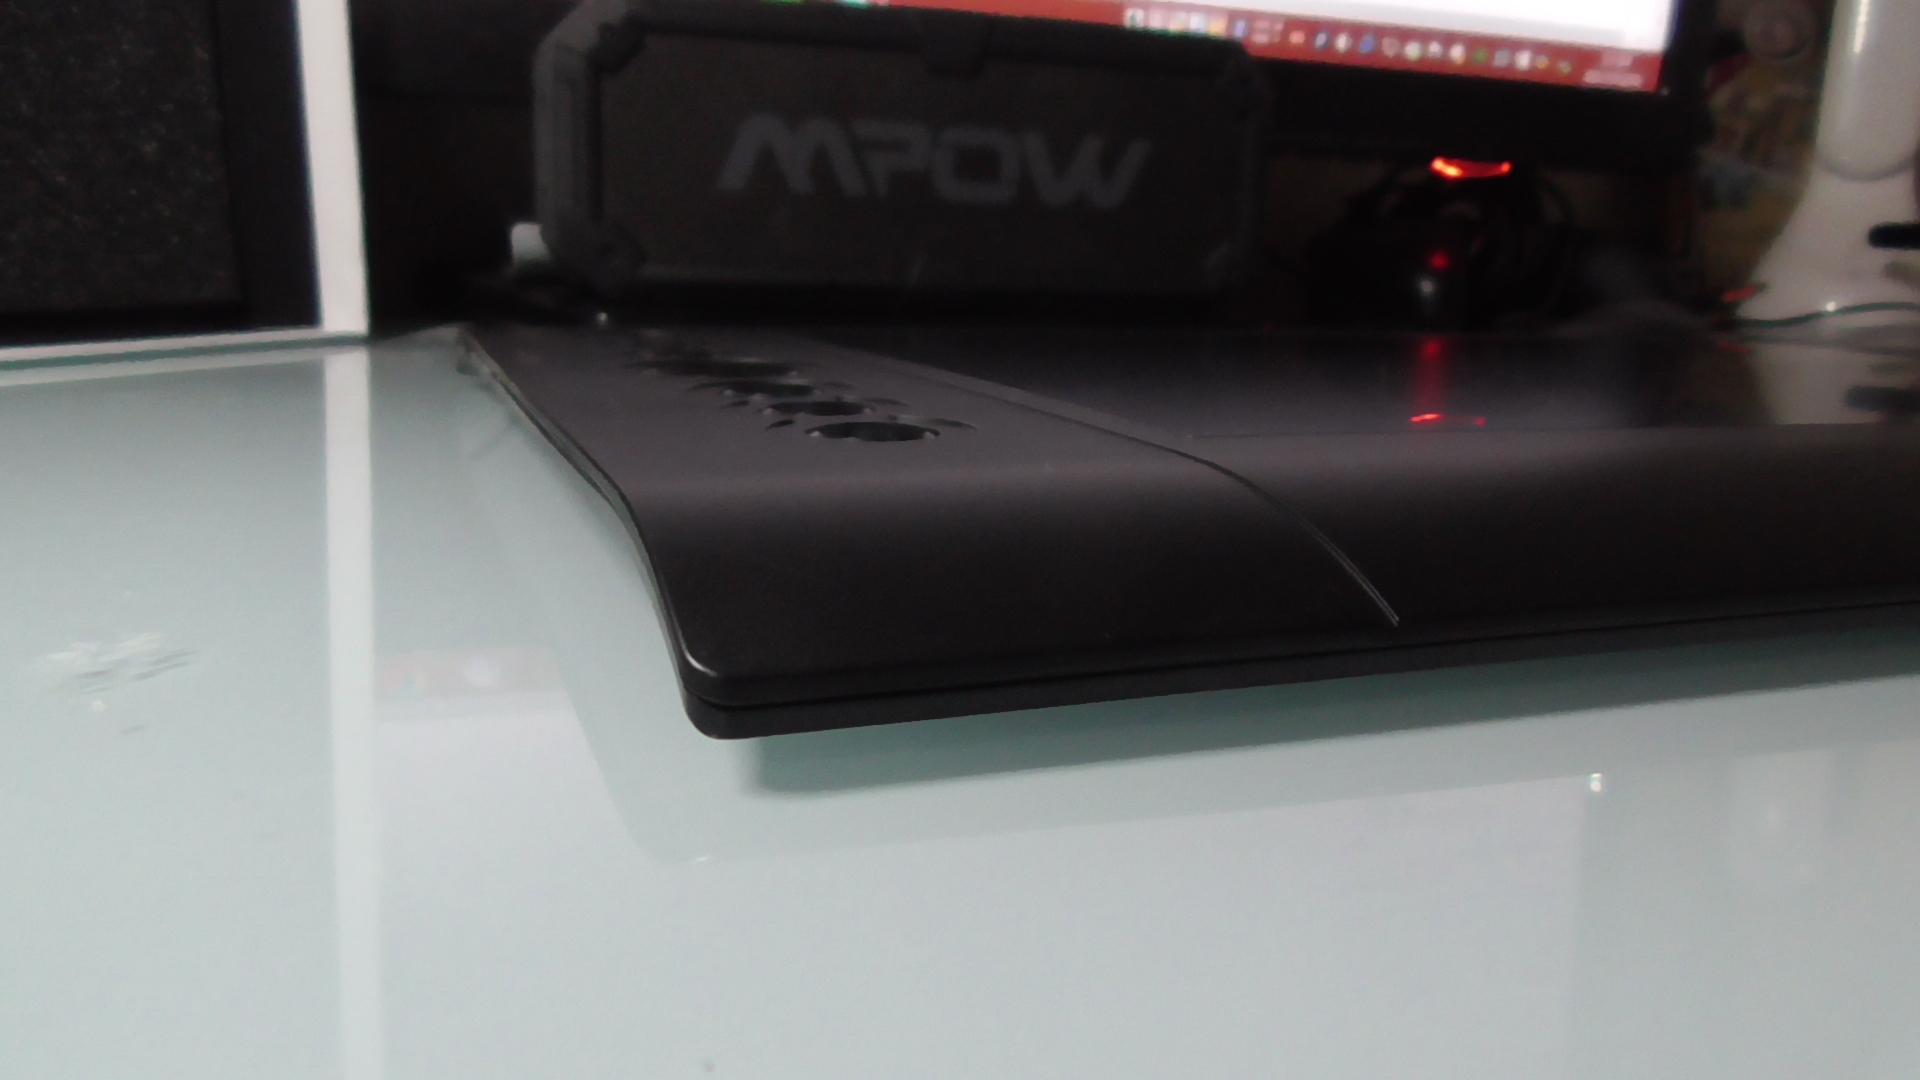 M2010012.jpg